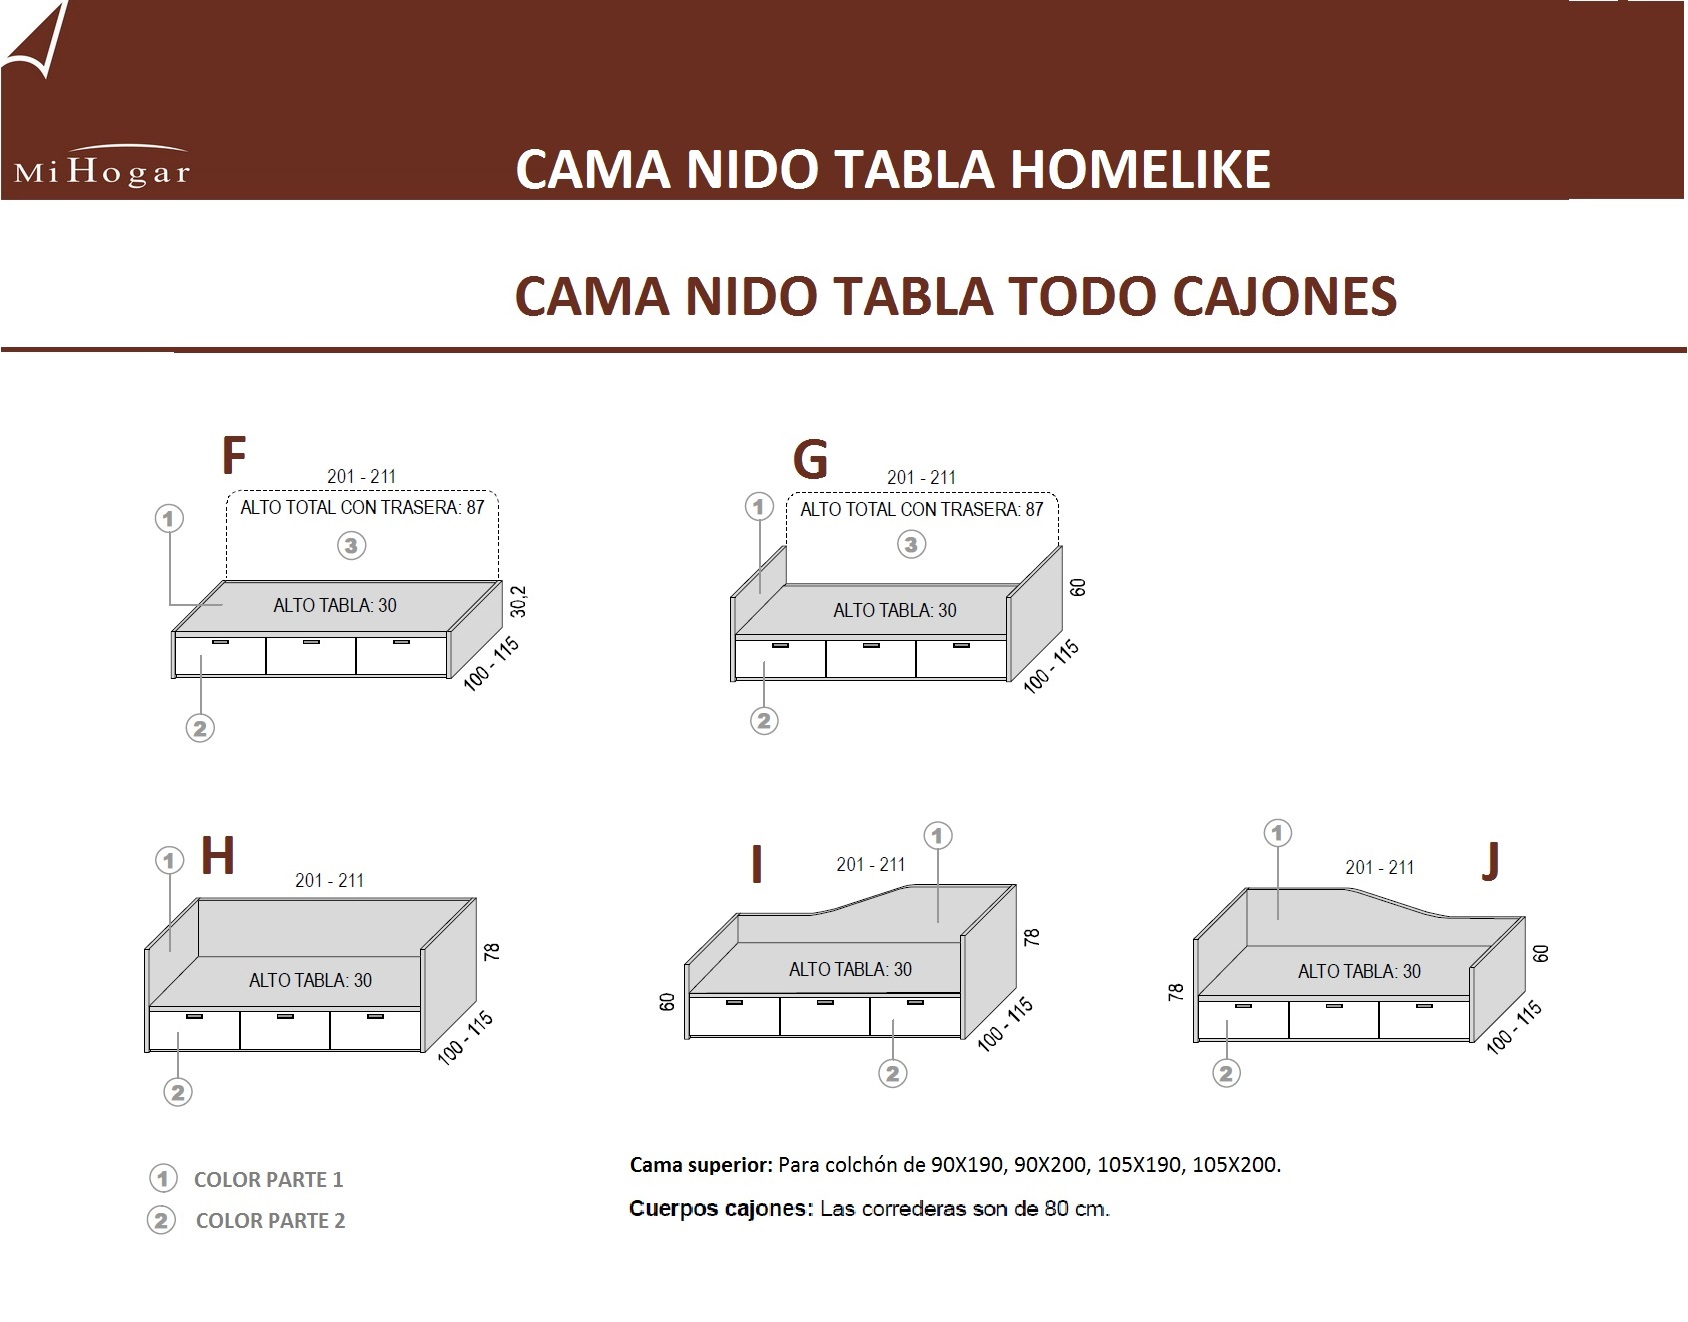 Cama nido tabla homelike muebles mi hogar for Medidas cama compacta